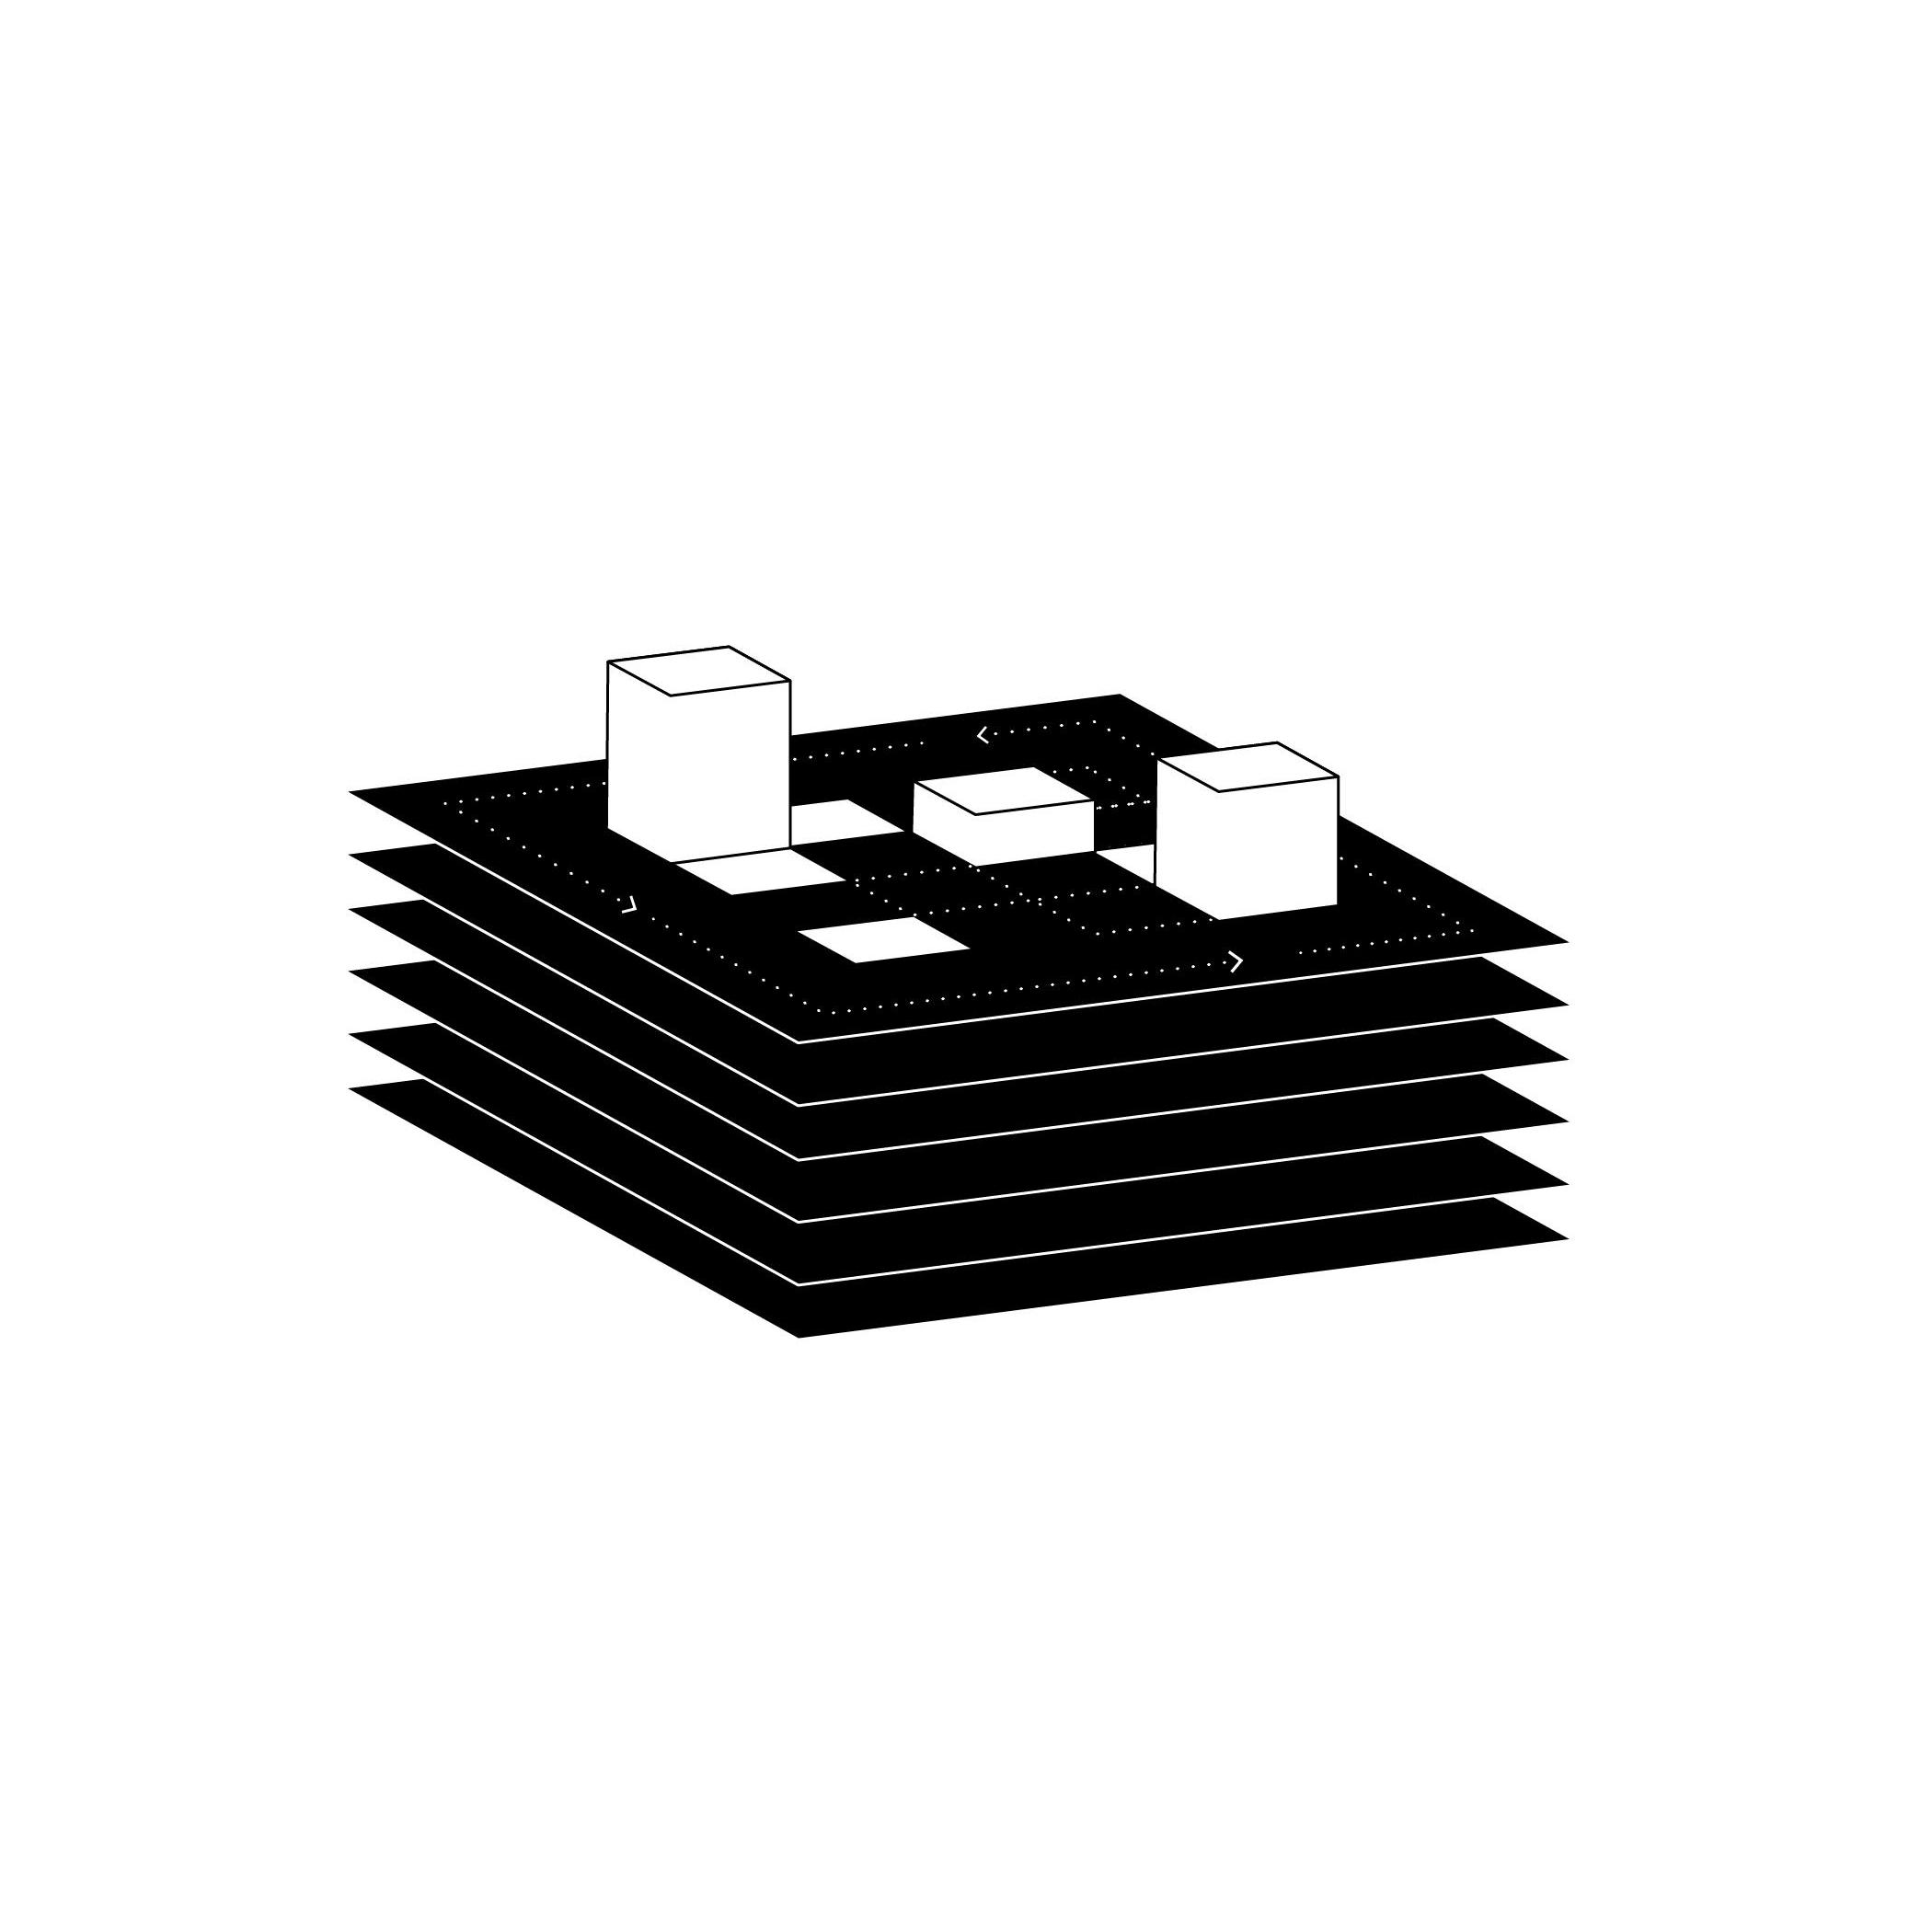 Diagrams-16.jpg